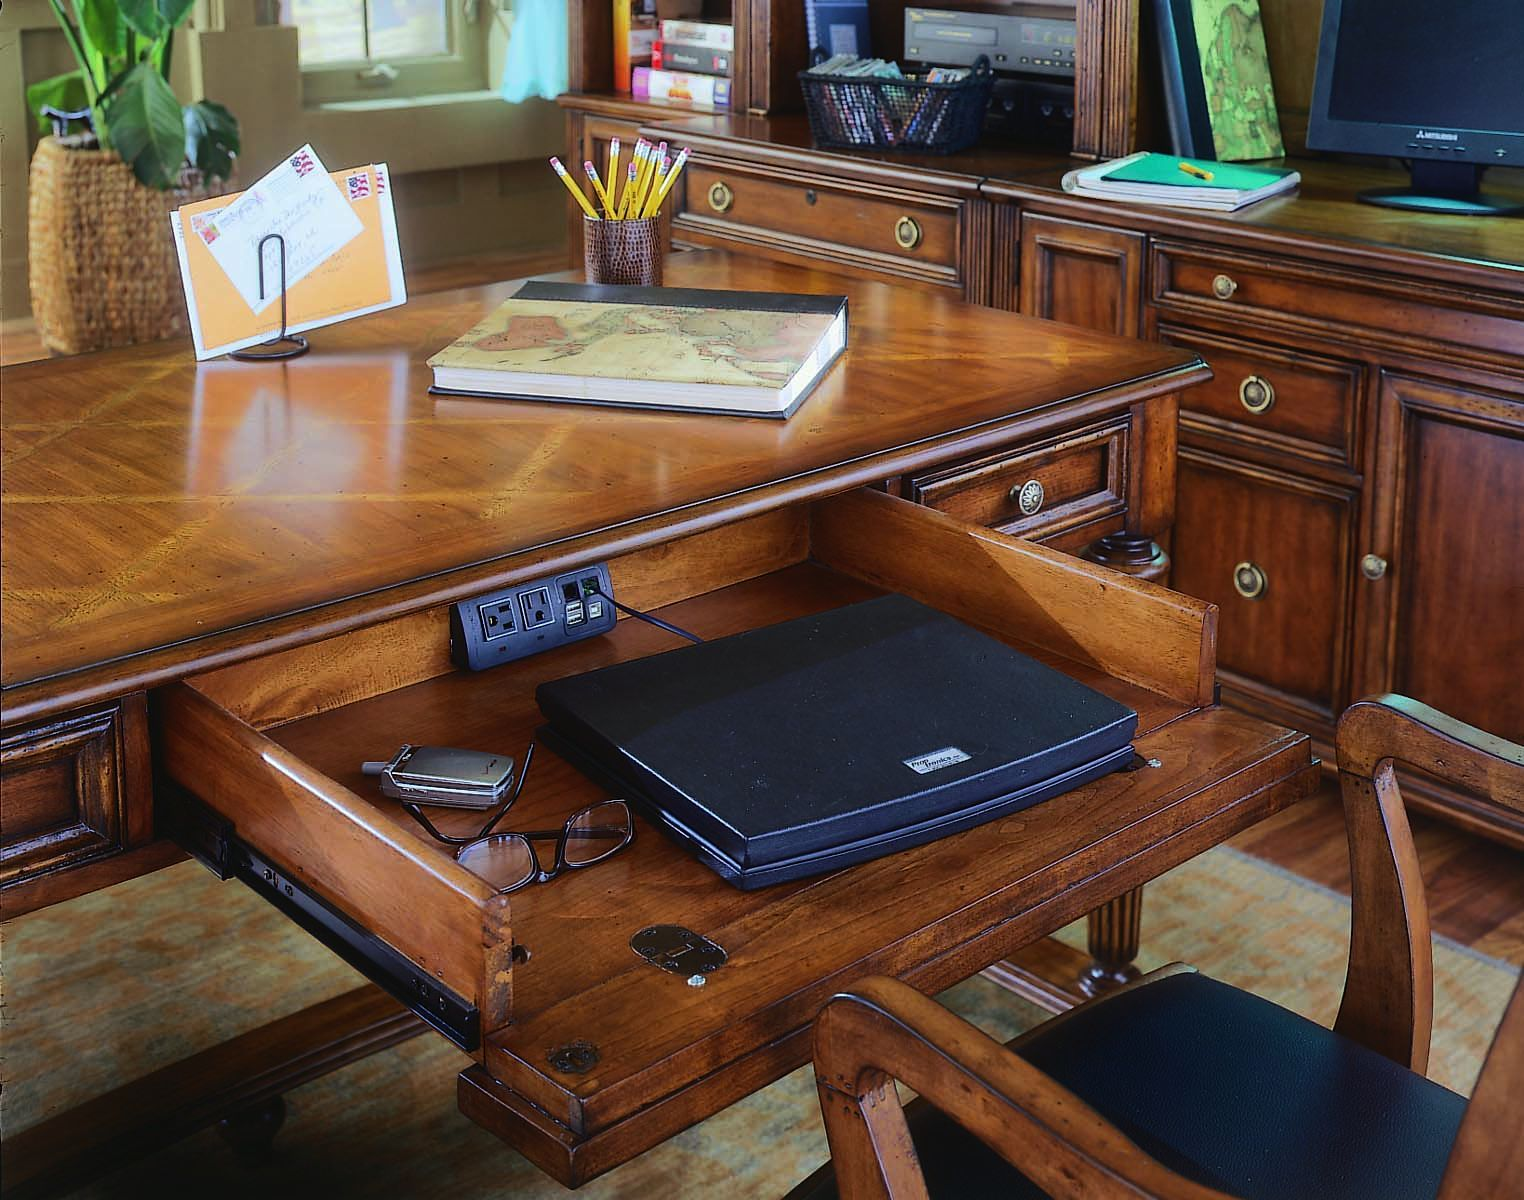 Pedestal desk leg ideas | Hooker Furniture Home Office Leg Desk 281-10-458 - Furniture Solution ...